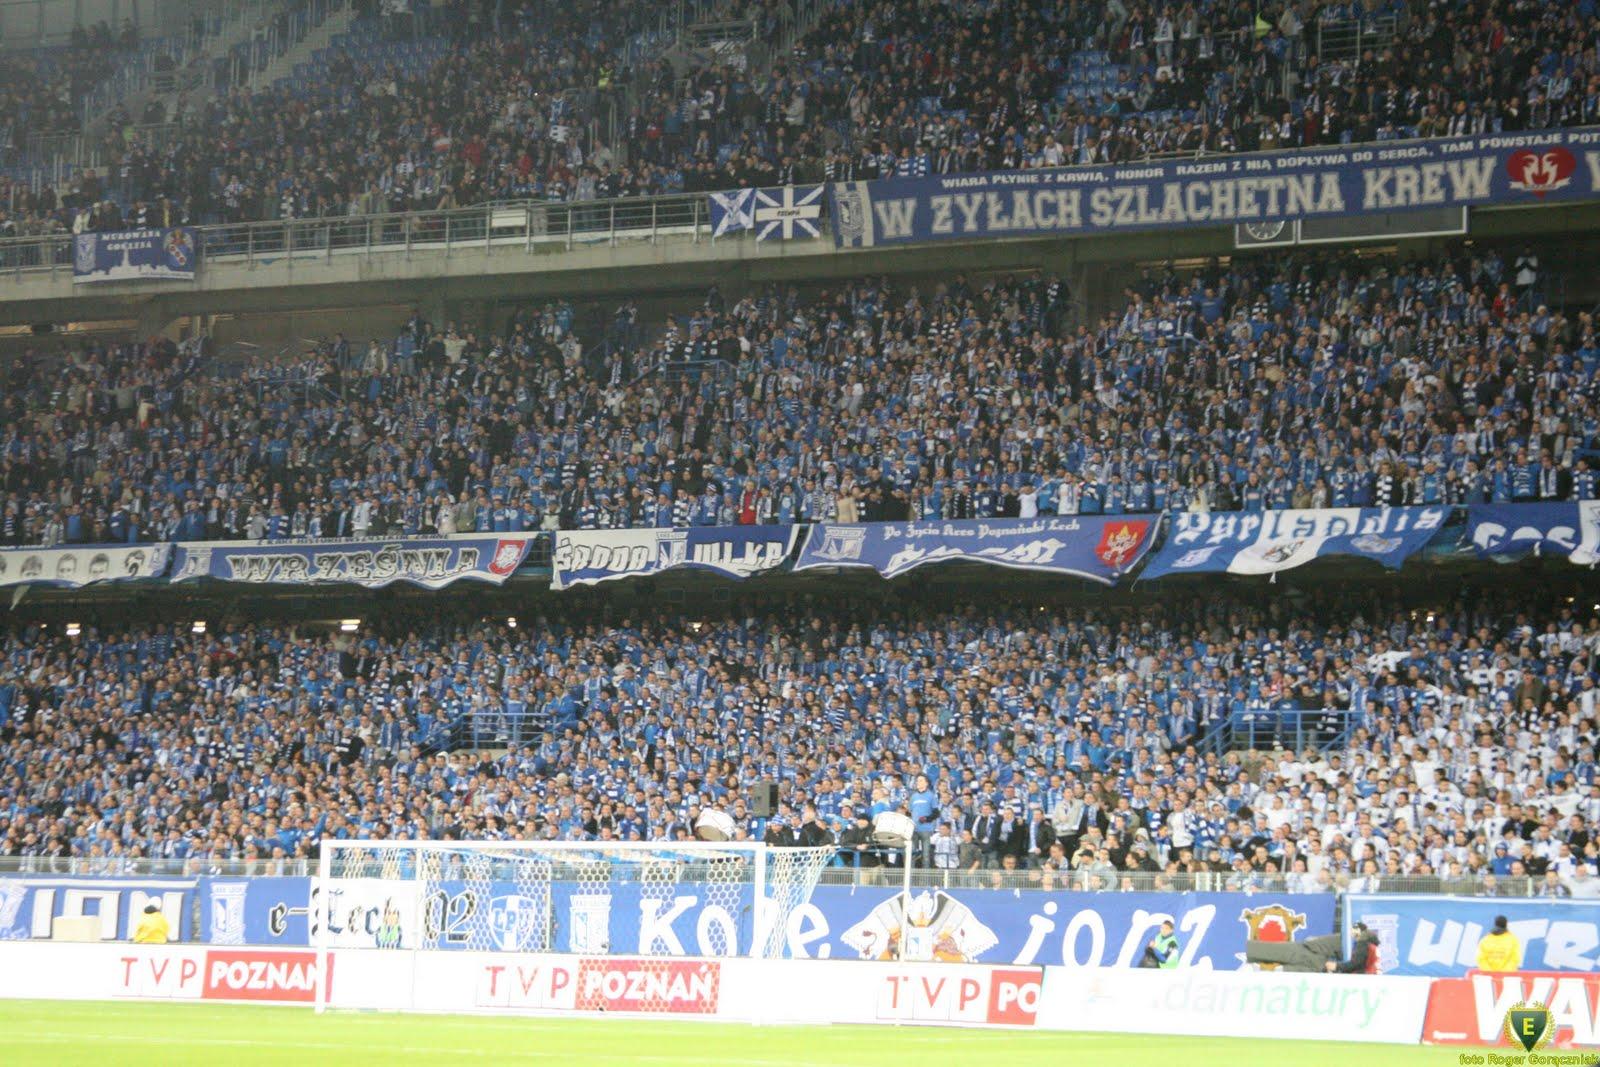 Lech Poznań Wikipedia: File:Lech Poznan Fans In Stadium.jpg